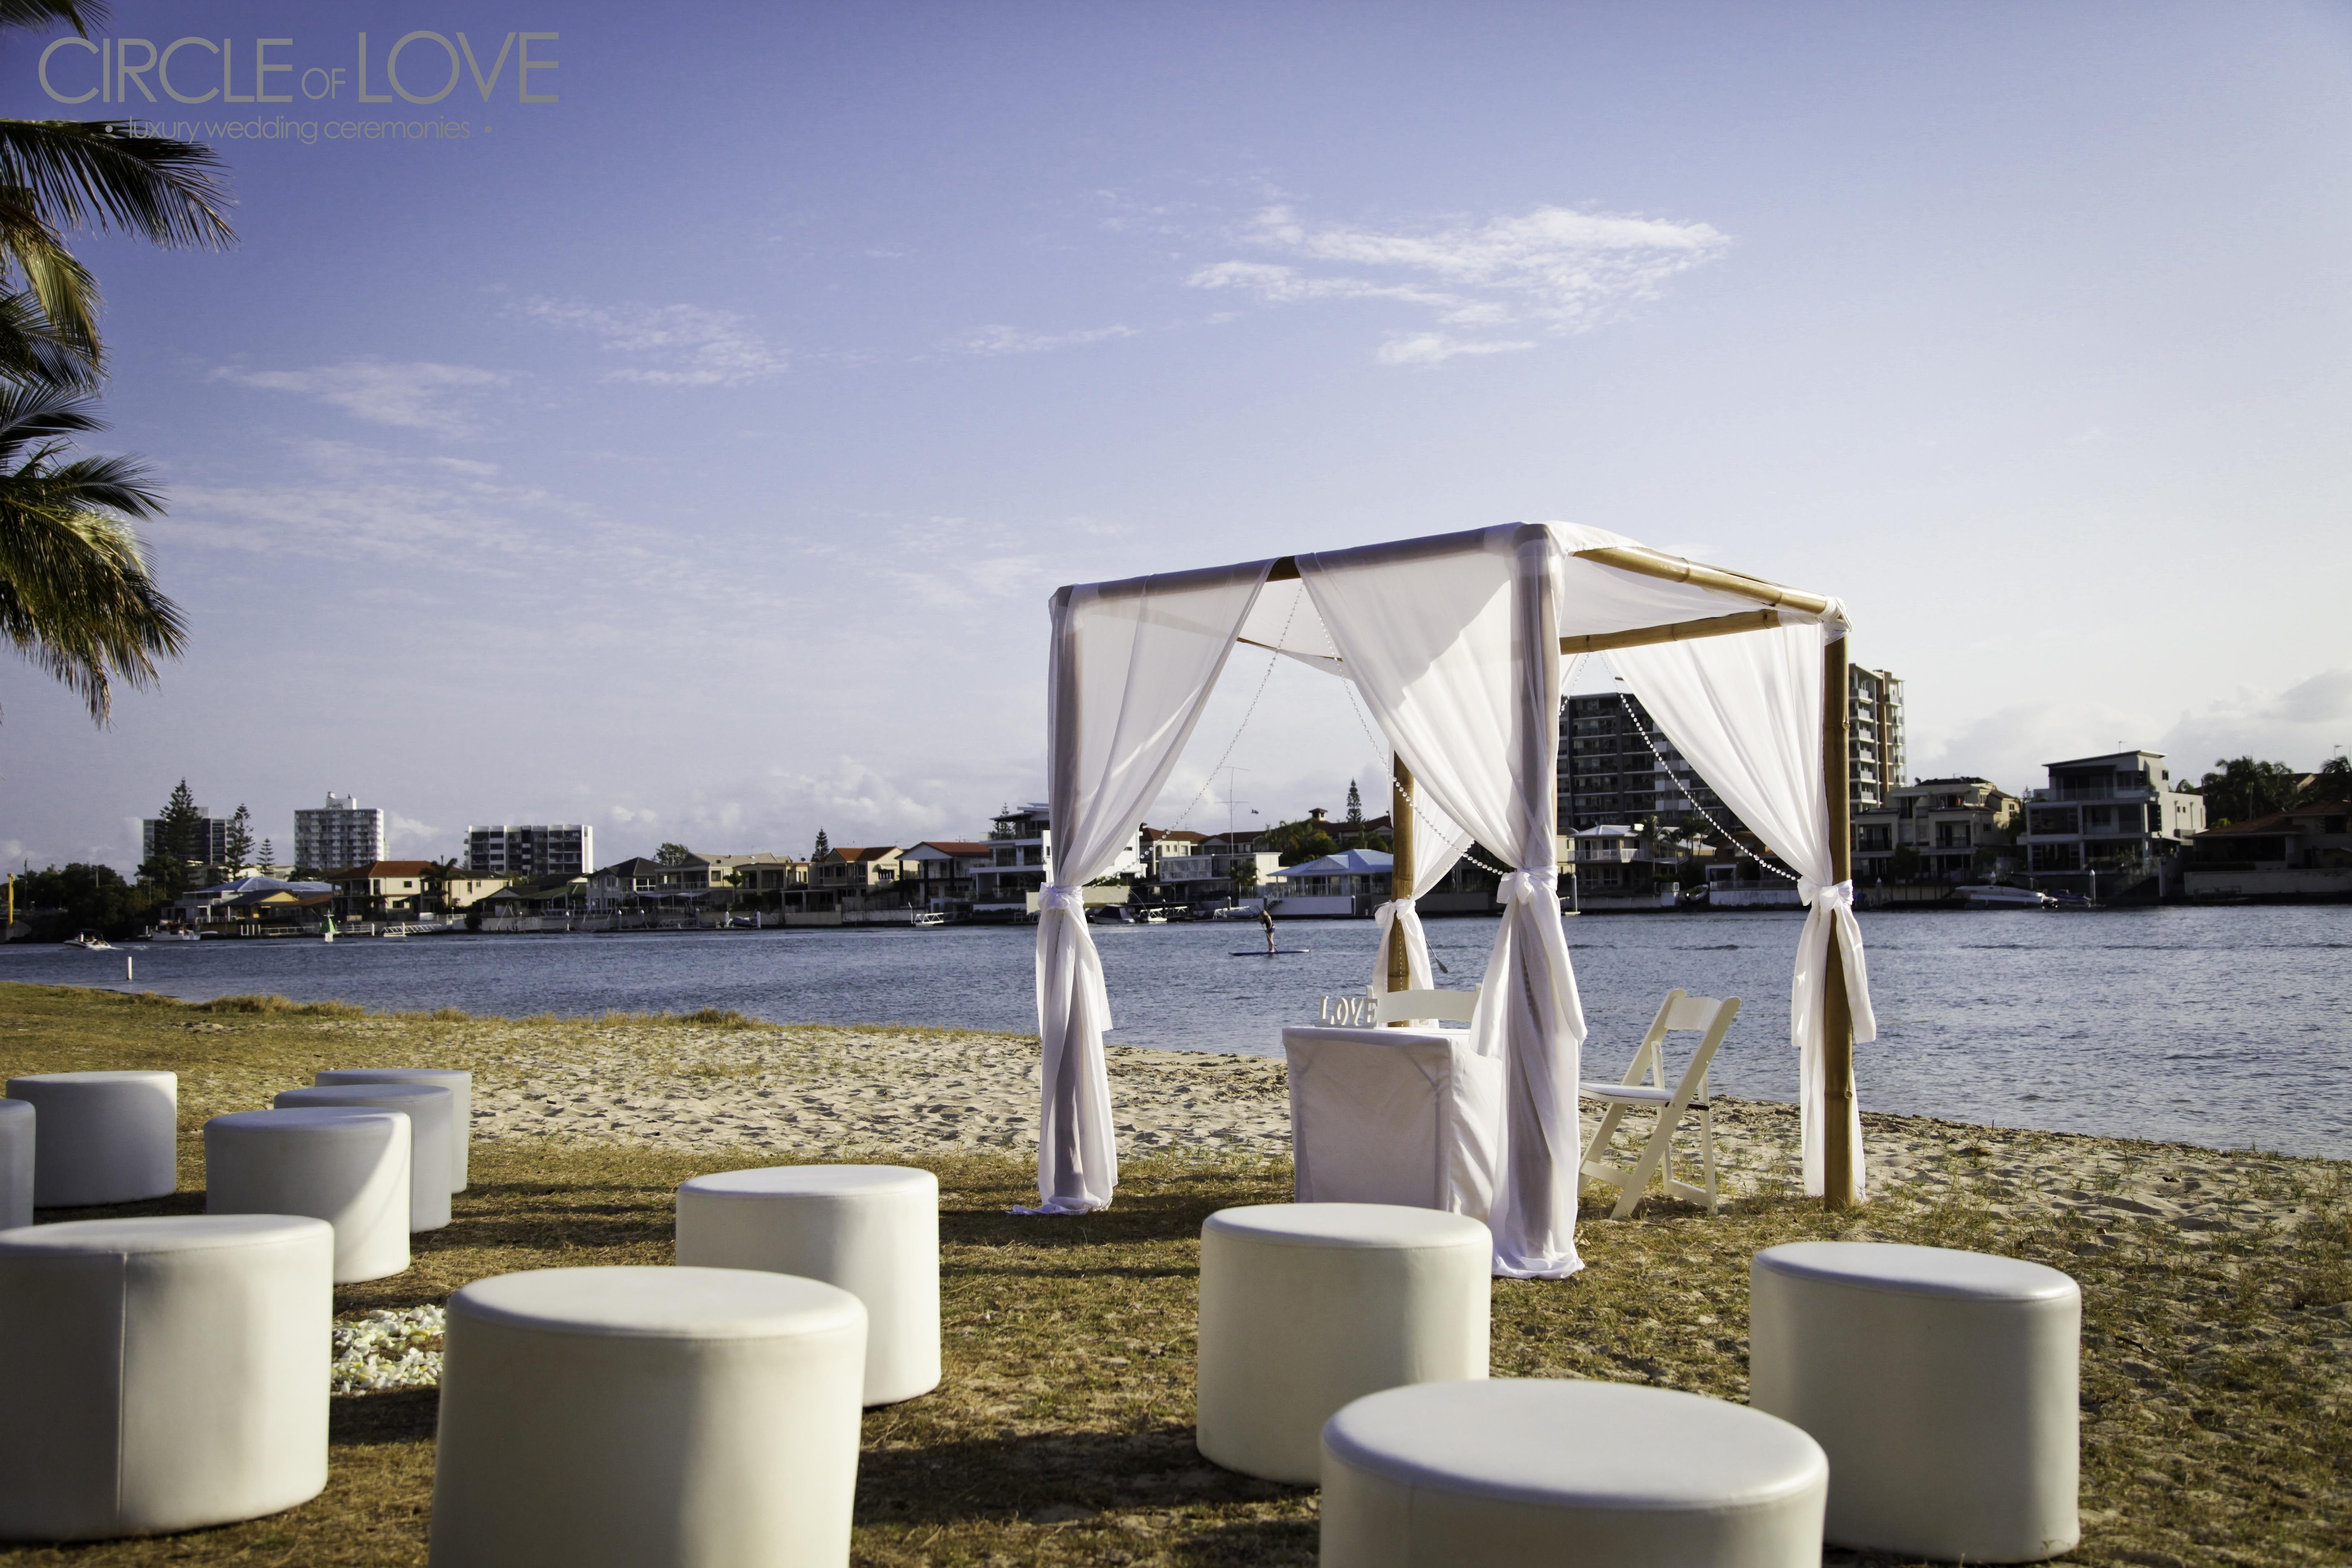 wedding receptions gold coast qld%0A Budds Beach Wedding Gold Coast Wedding Ceremony  www circleofloveweddings com au